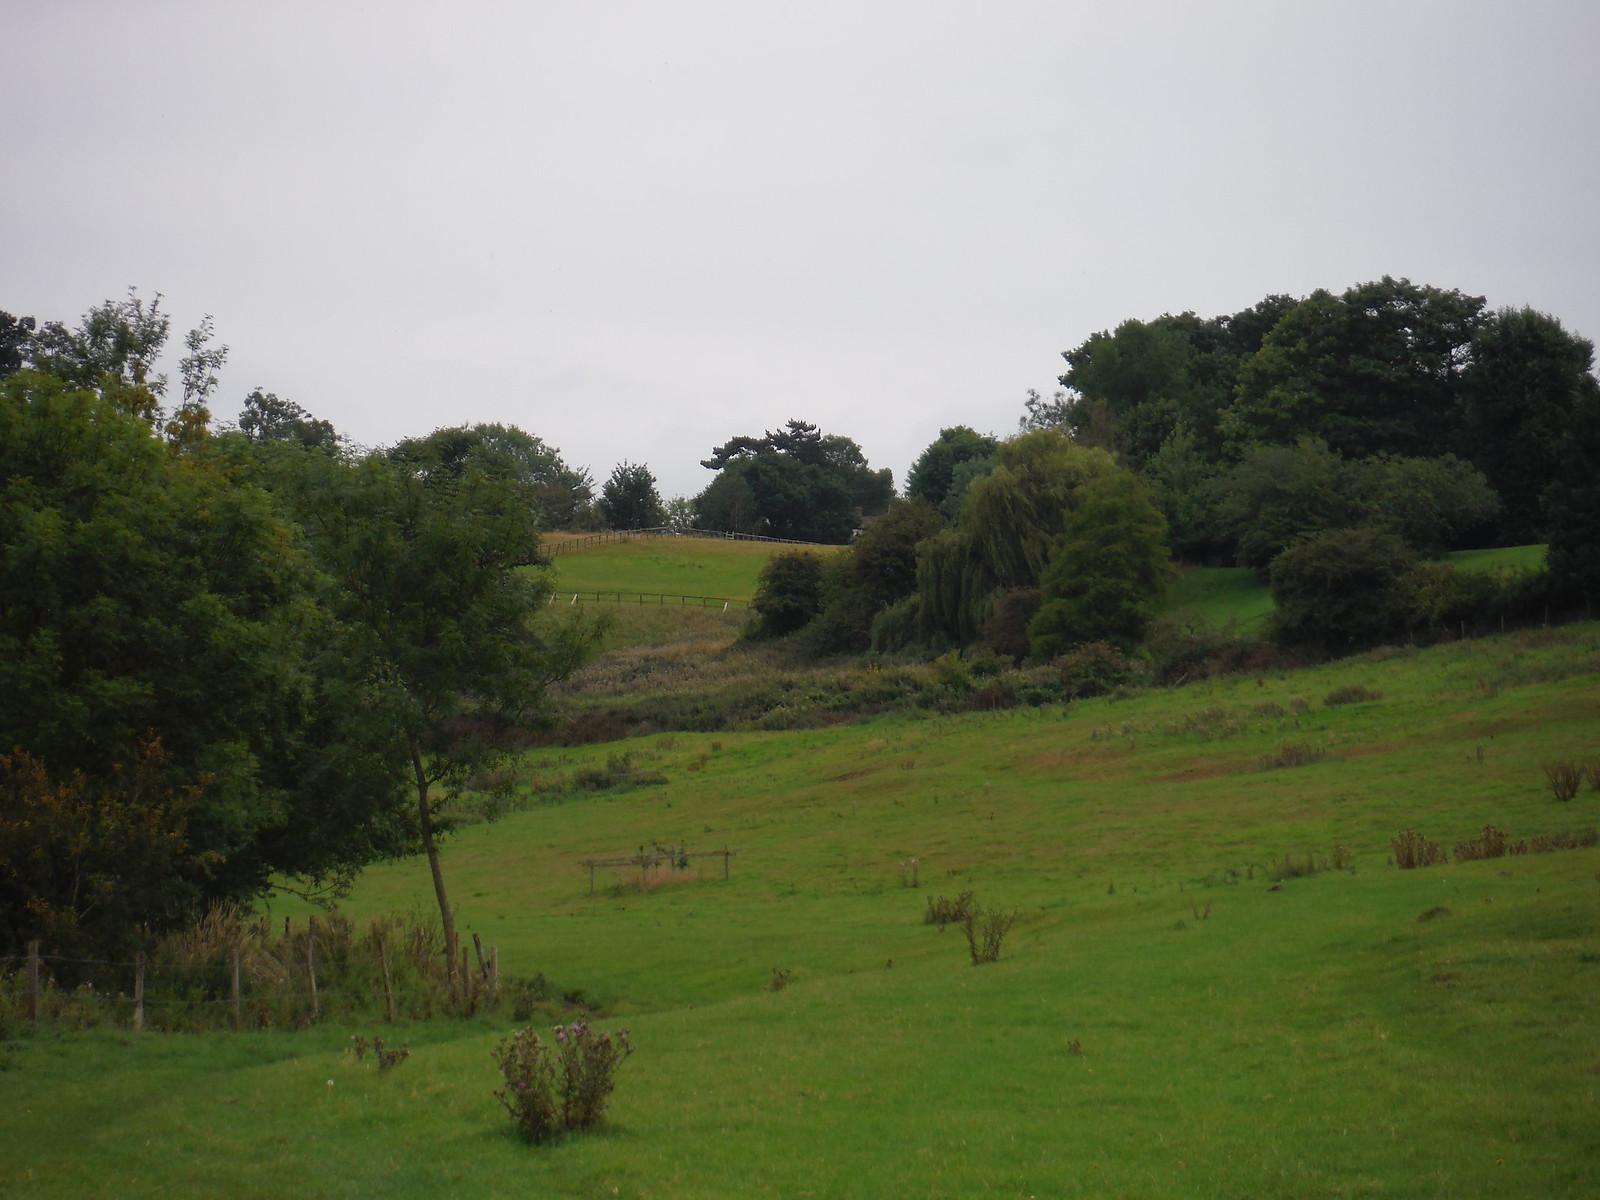 Lilley's Wood, Ash Valley SWC Walk 164 Roydon to Sawbridgeworth via Henry Moore Foundation